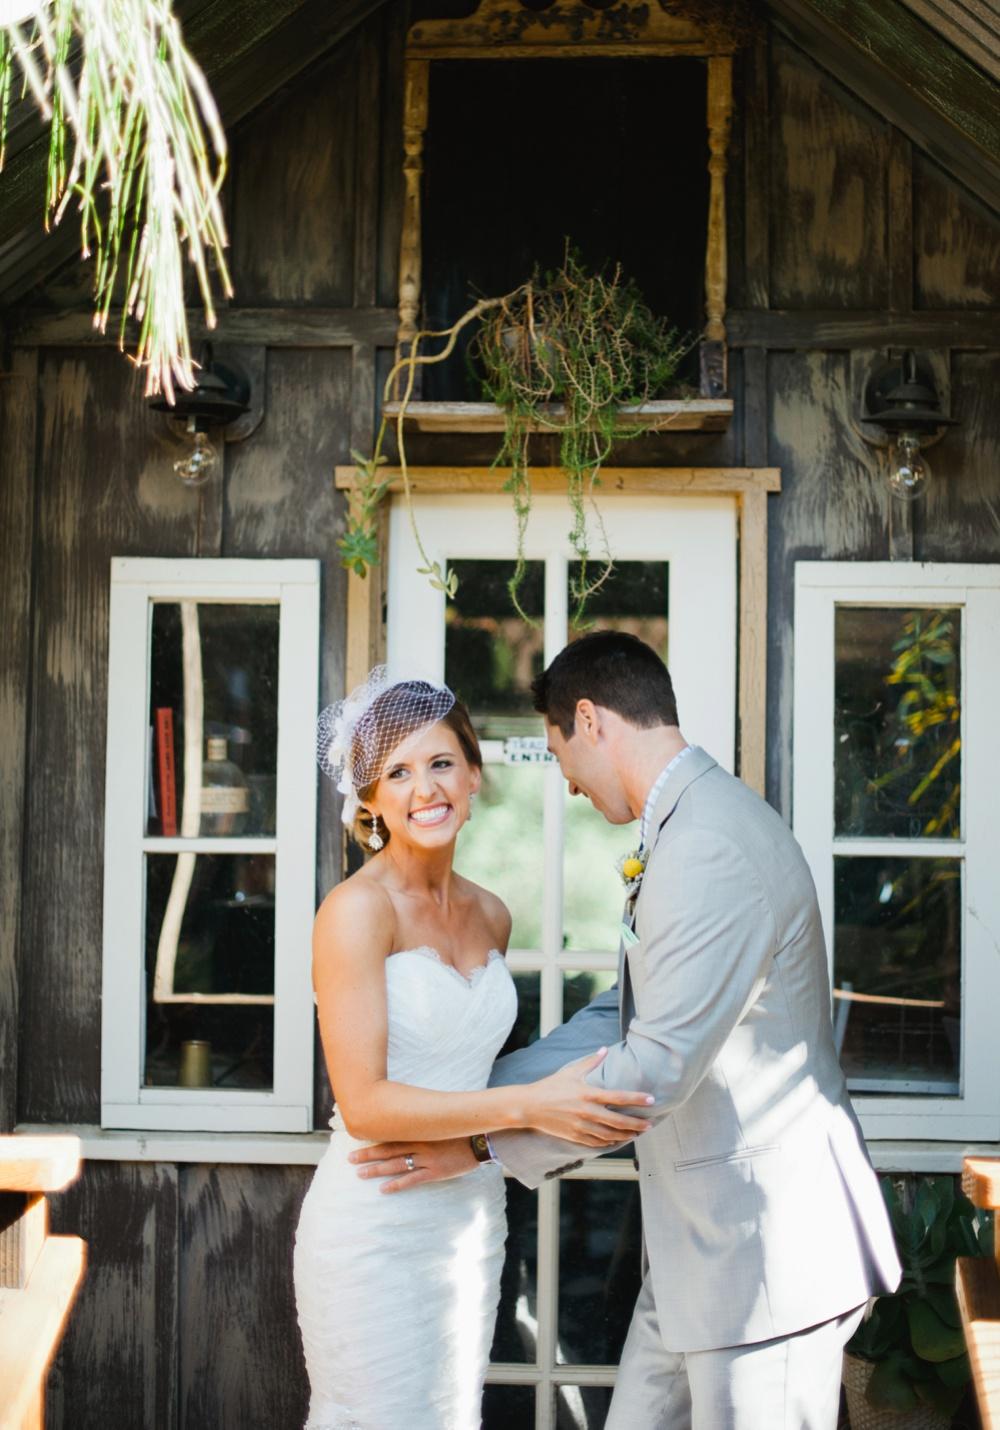 condors_nest_ranch_wedding_photographyN.JPG